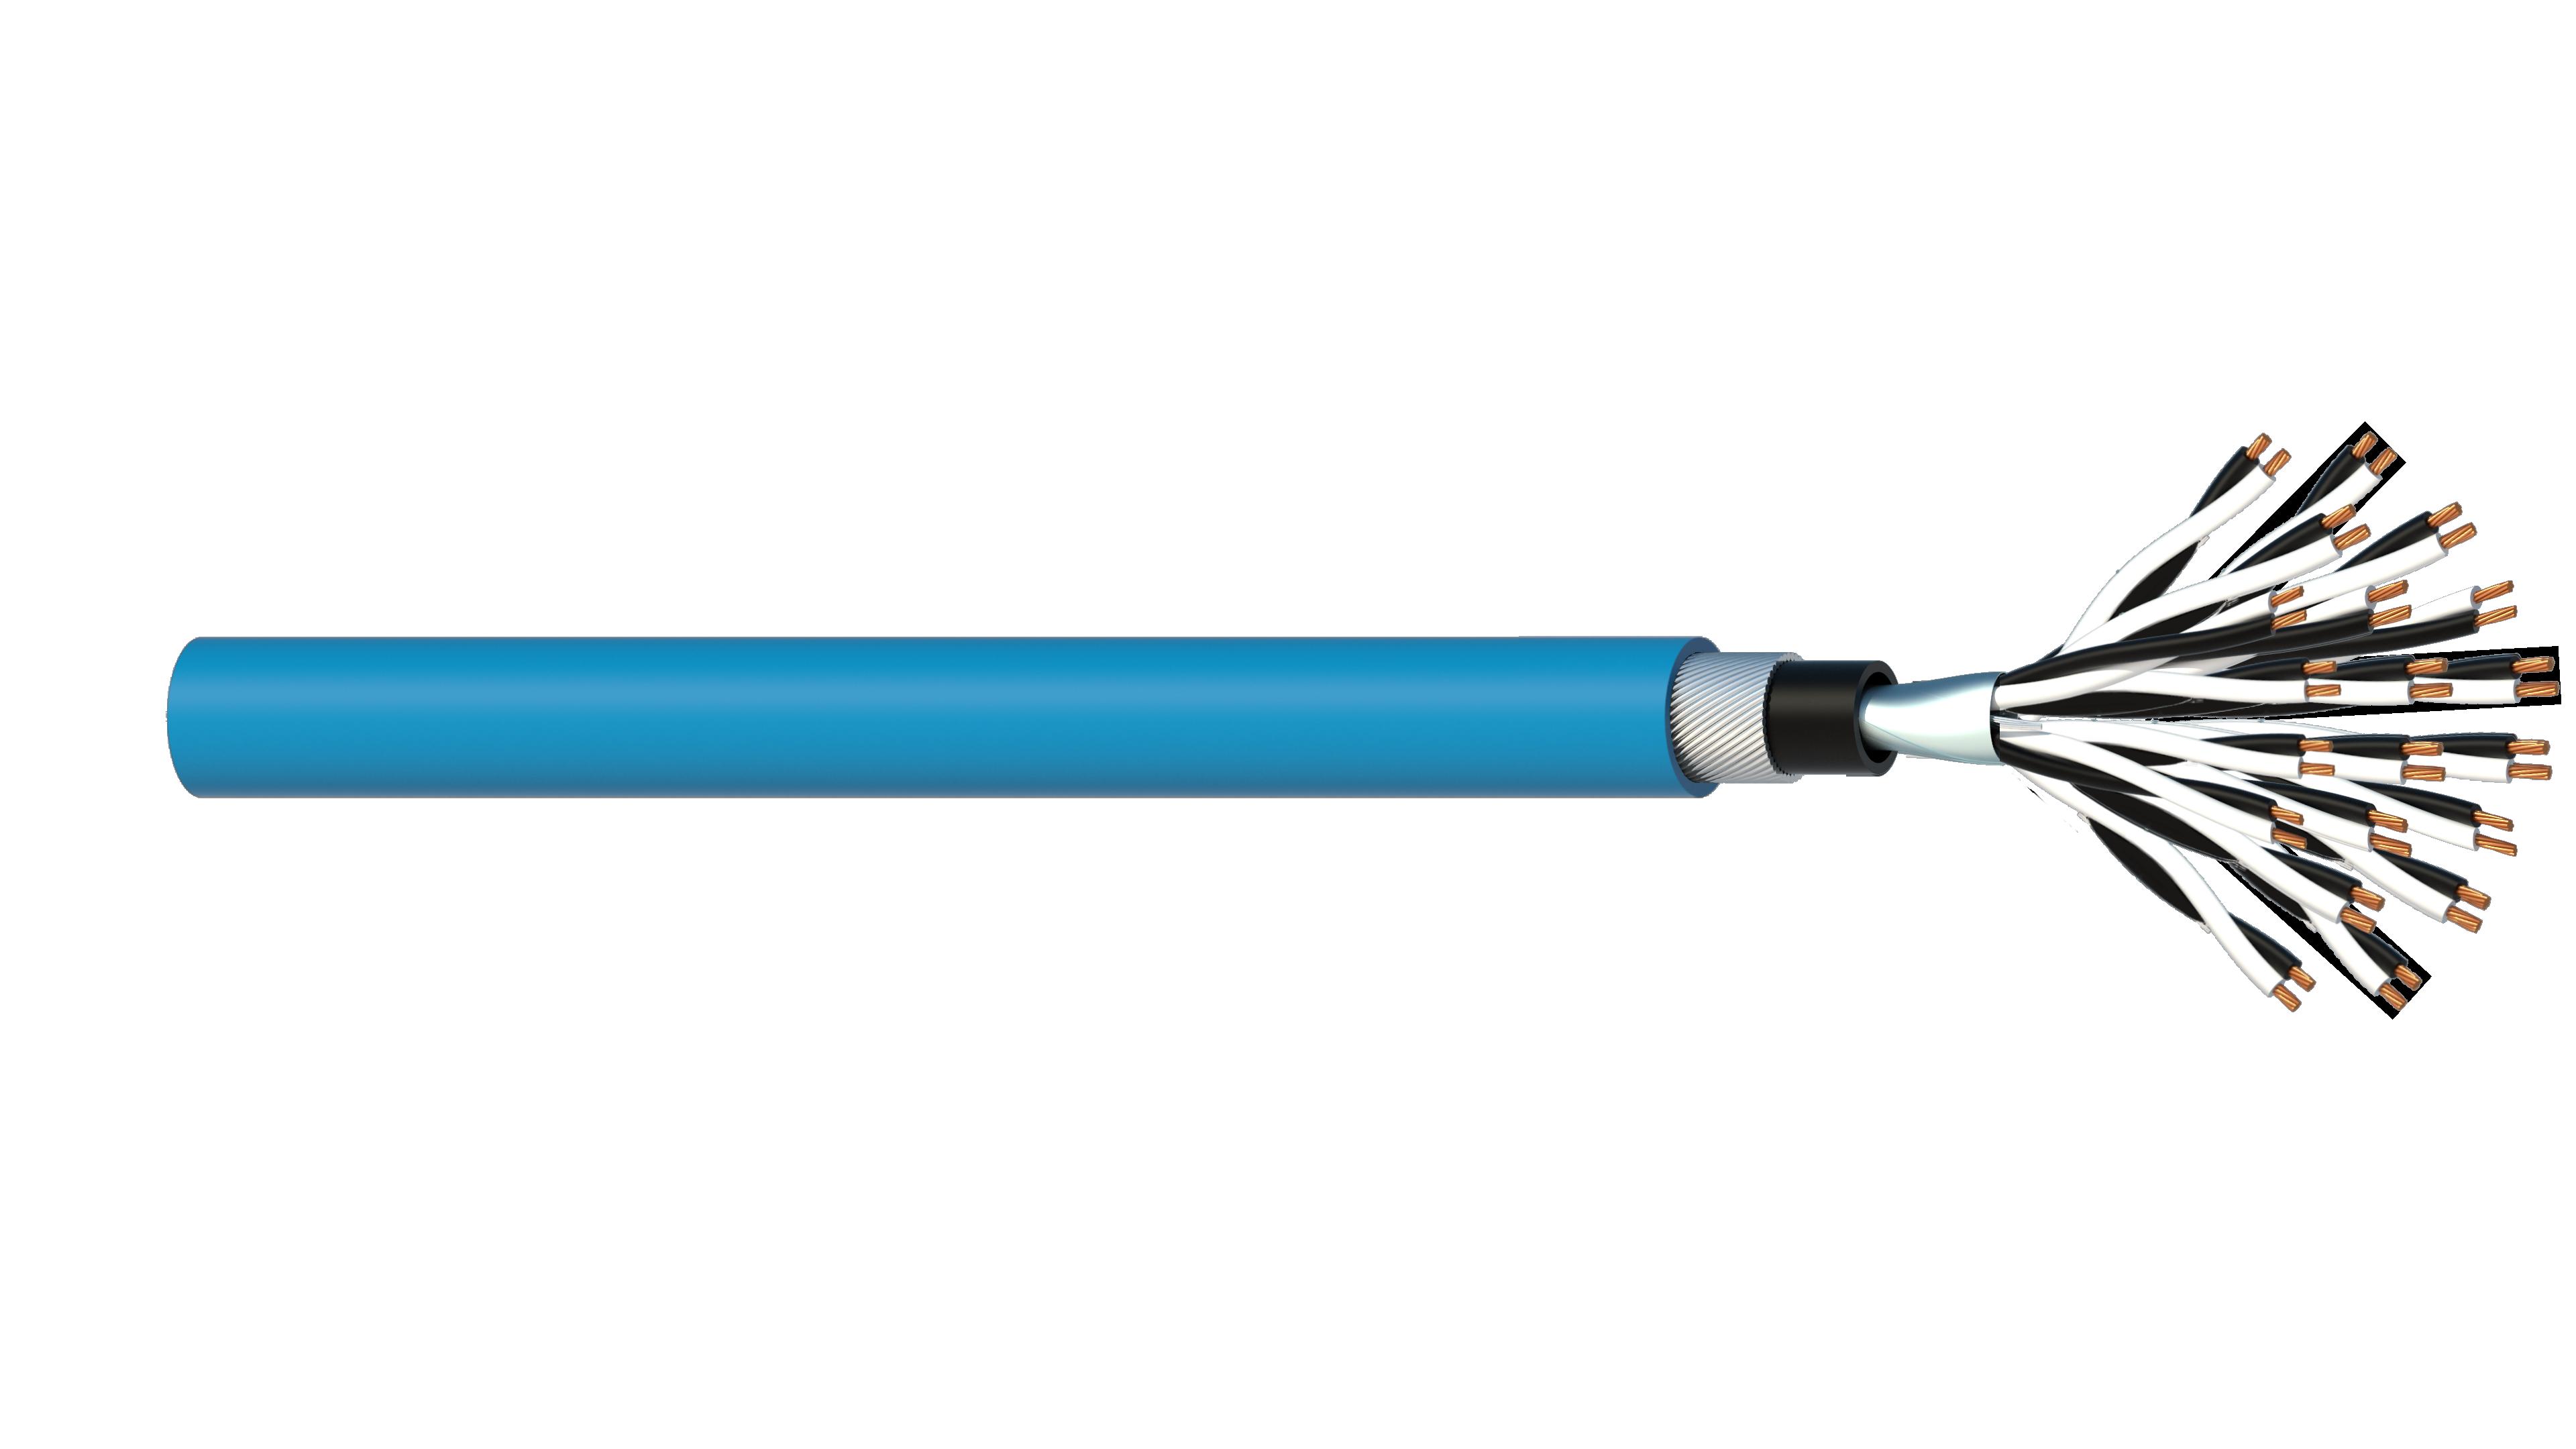 20 Pair 0.5mm2 Cu/PVC/OS/PVC/SWA/PVC Maser Instrumentation Cable - Blue Sheath